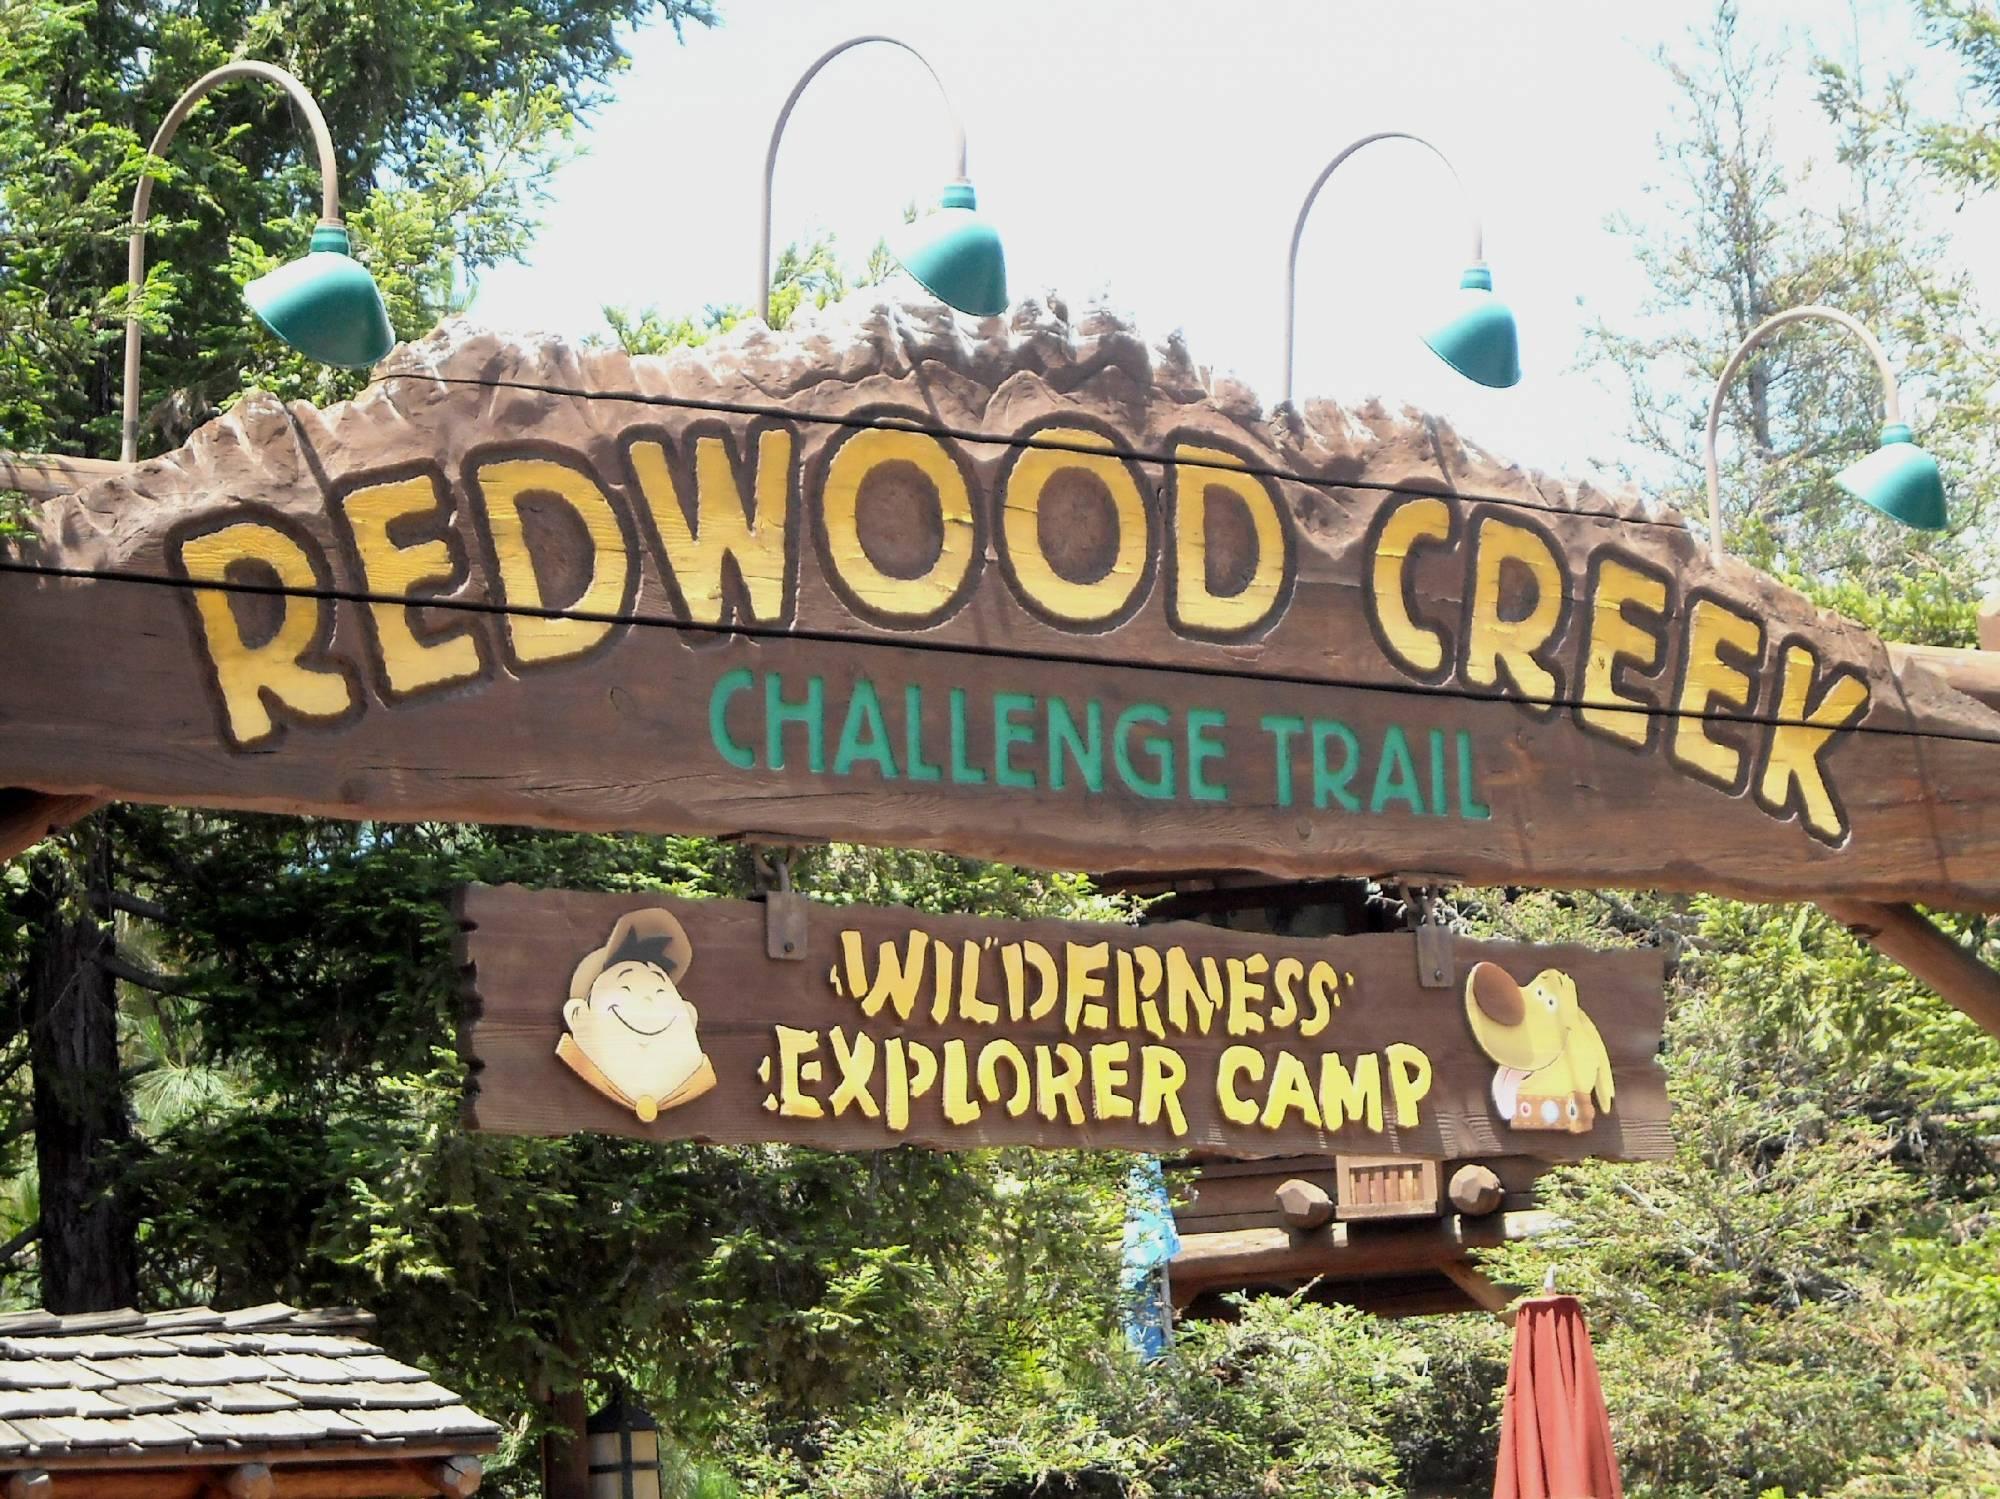 Redwood Creek Challenge Trail Sign (Close)